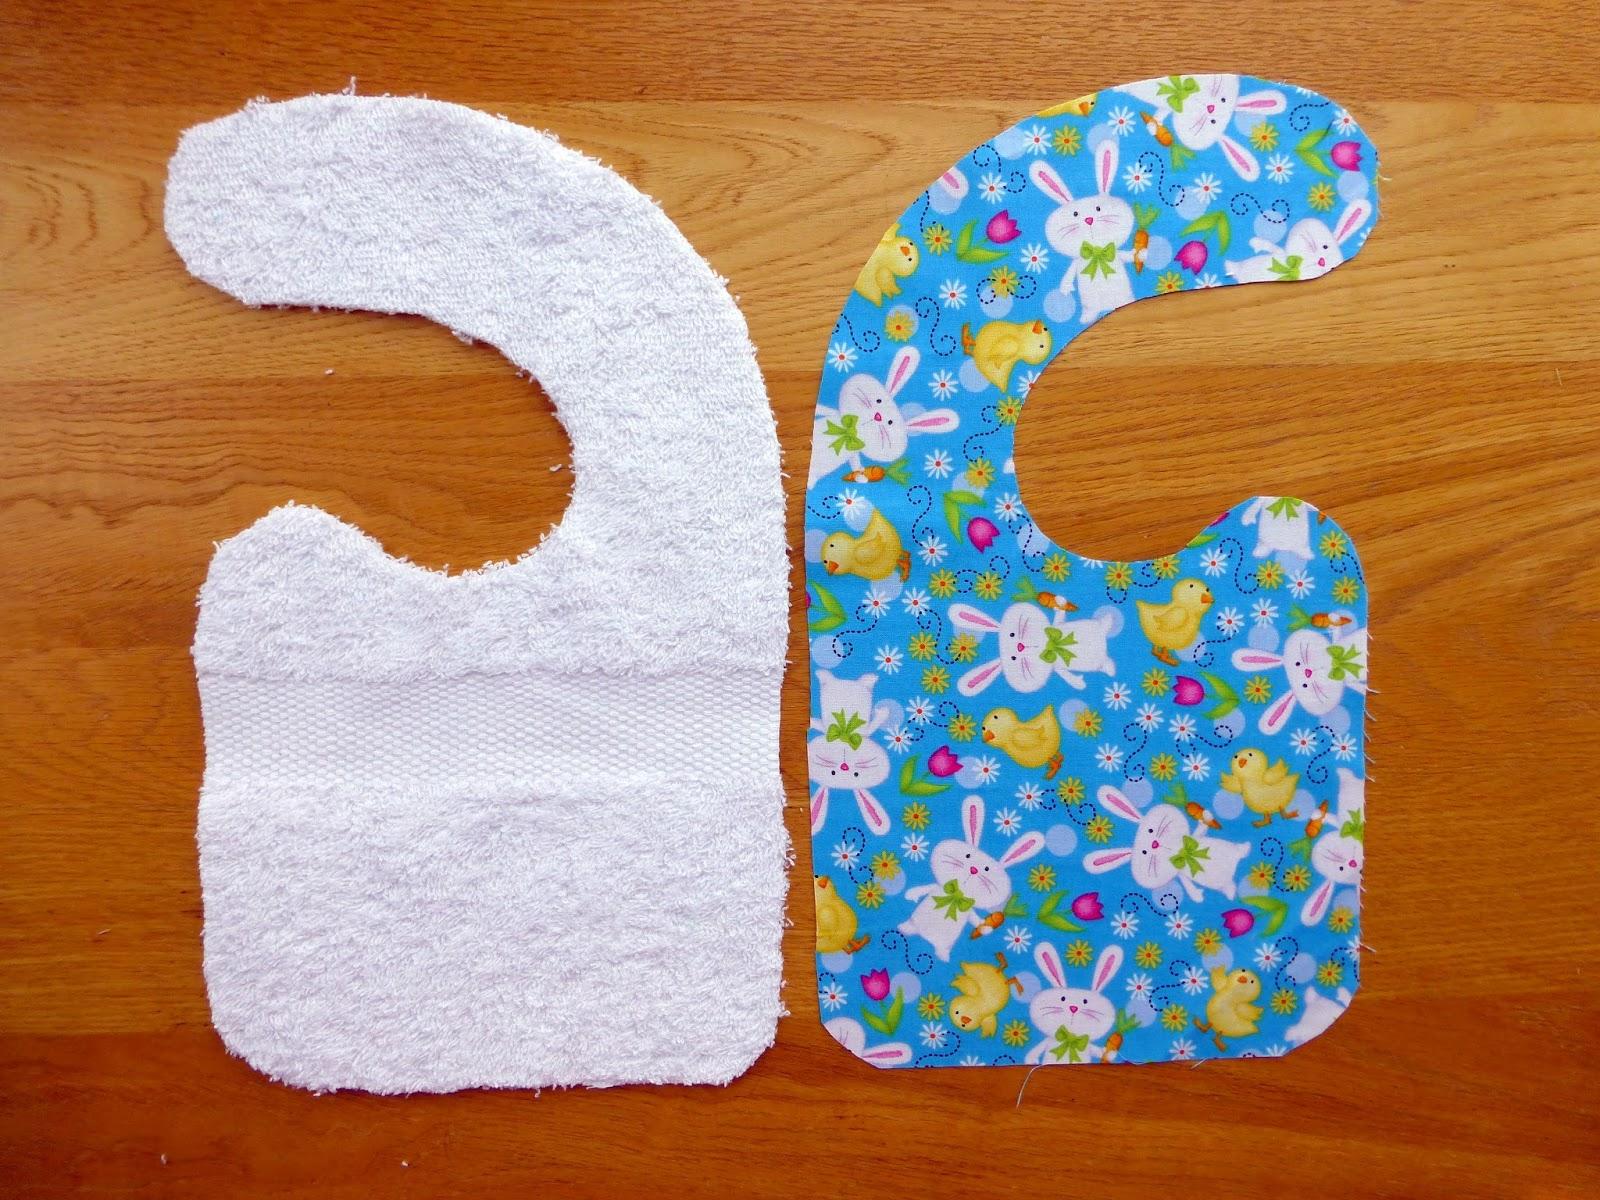 Easter Bibs Tutorial - Just Jude Designs - Quilting